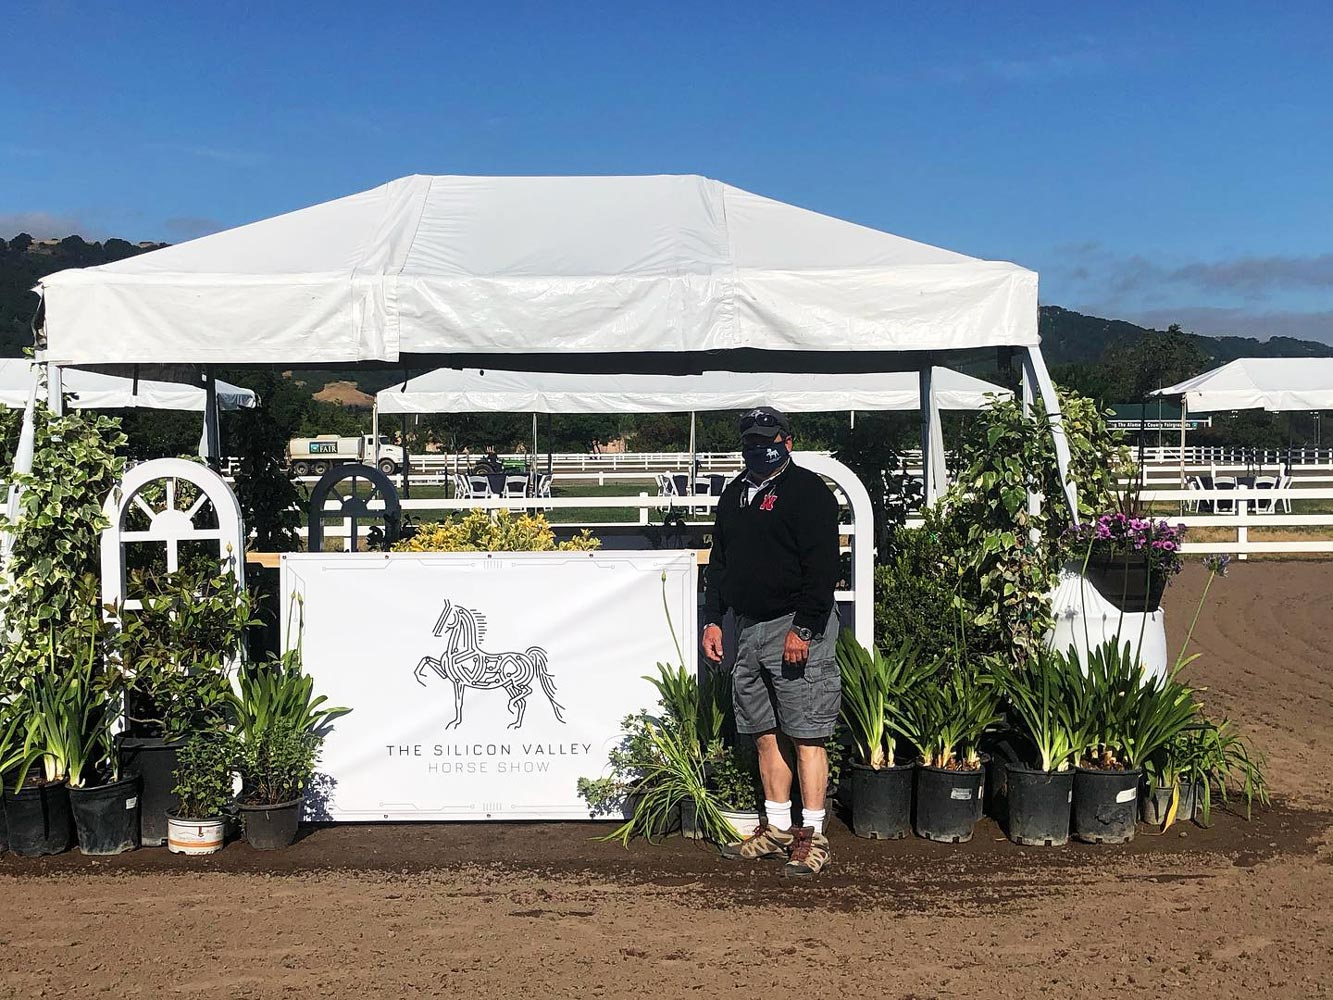 Horse show center ring signage